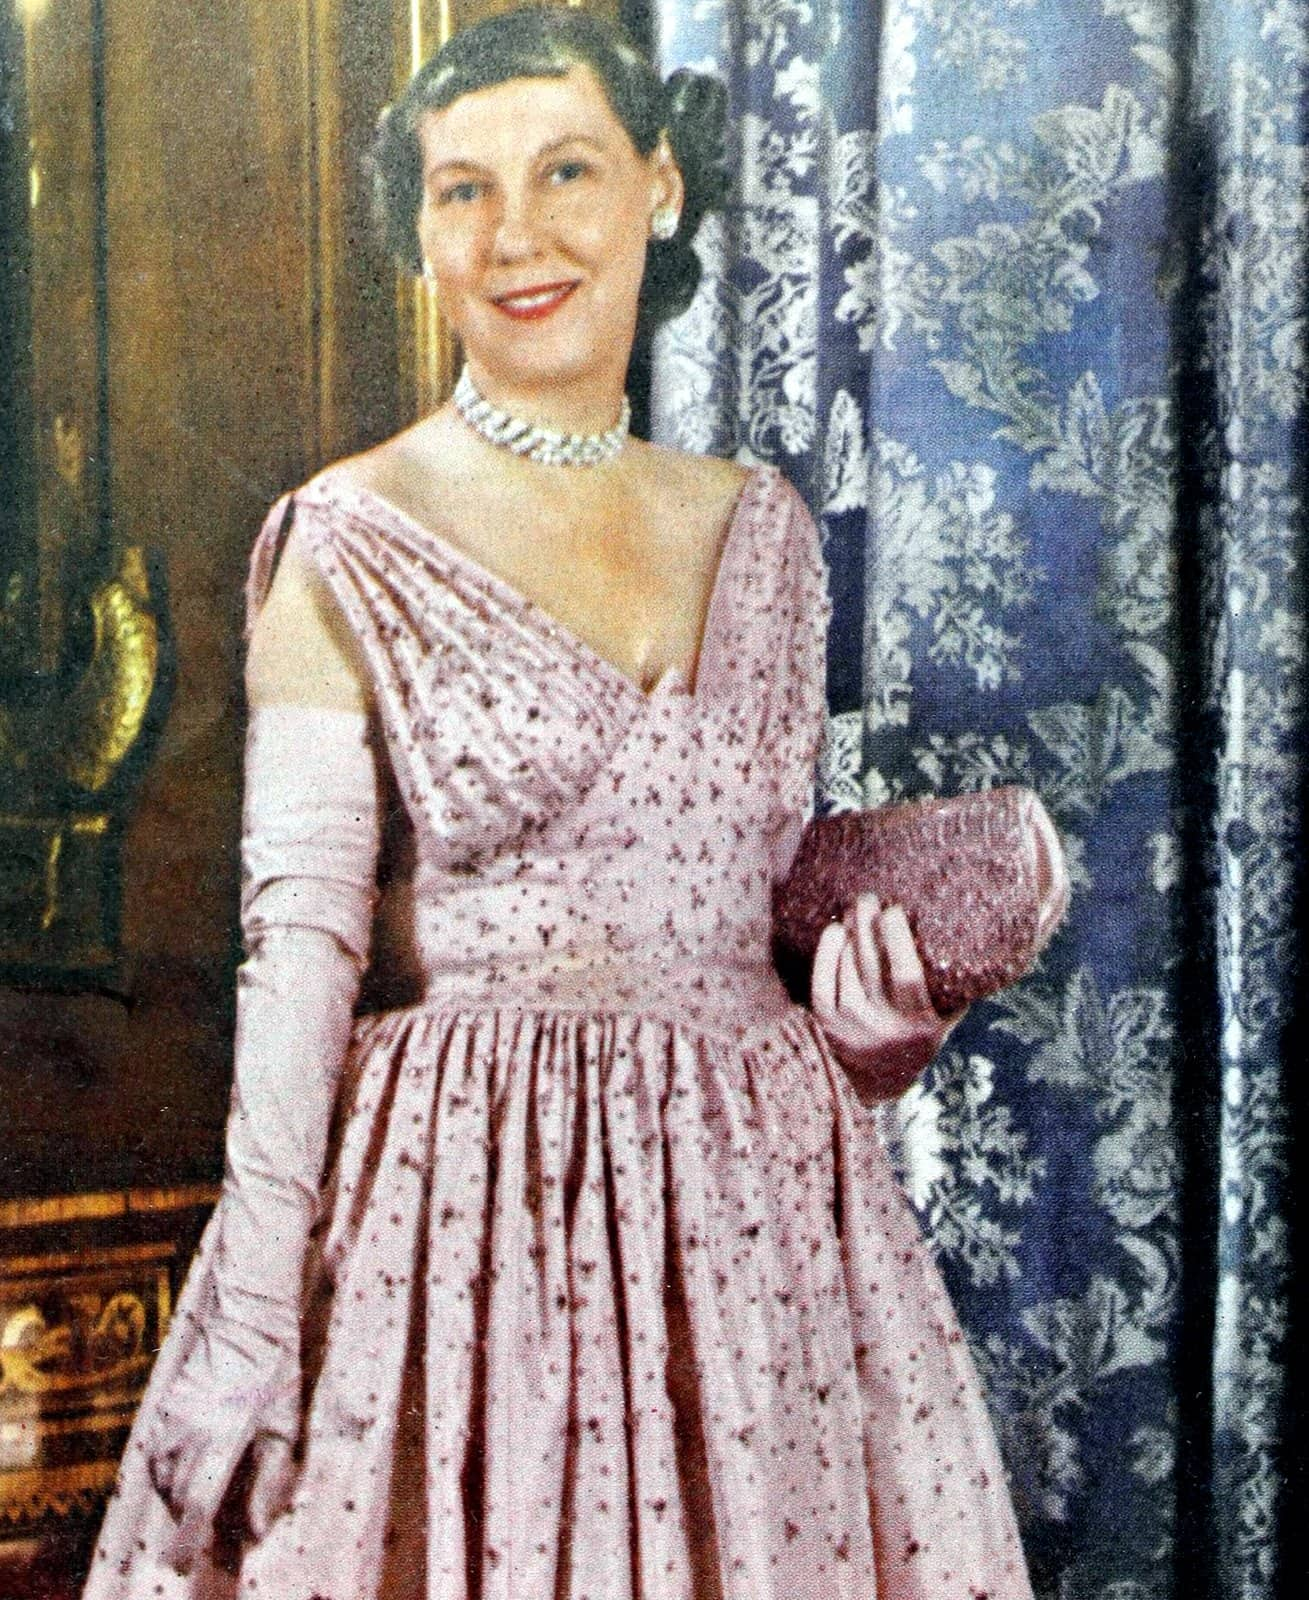 First Lady Mamie Eisenhower in Mamie Pink gloves - 1950s